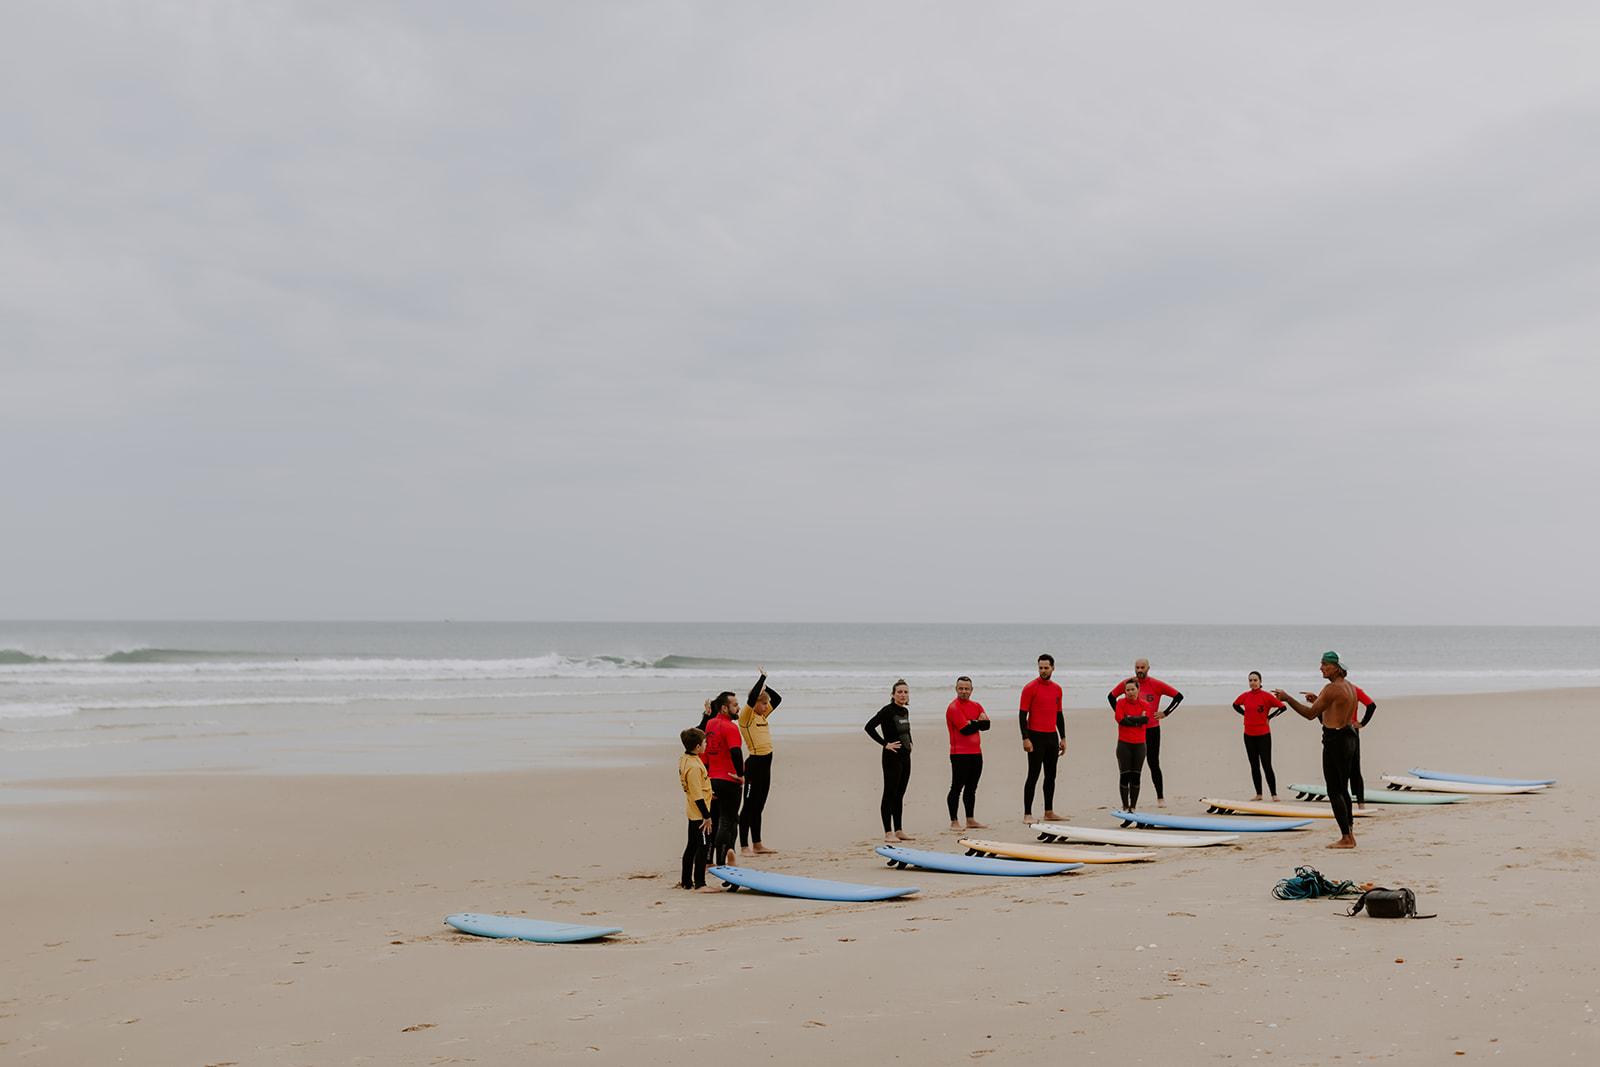 Mariage-bassin-Arcachon-activite-surf-amis